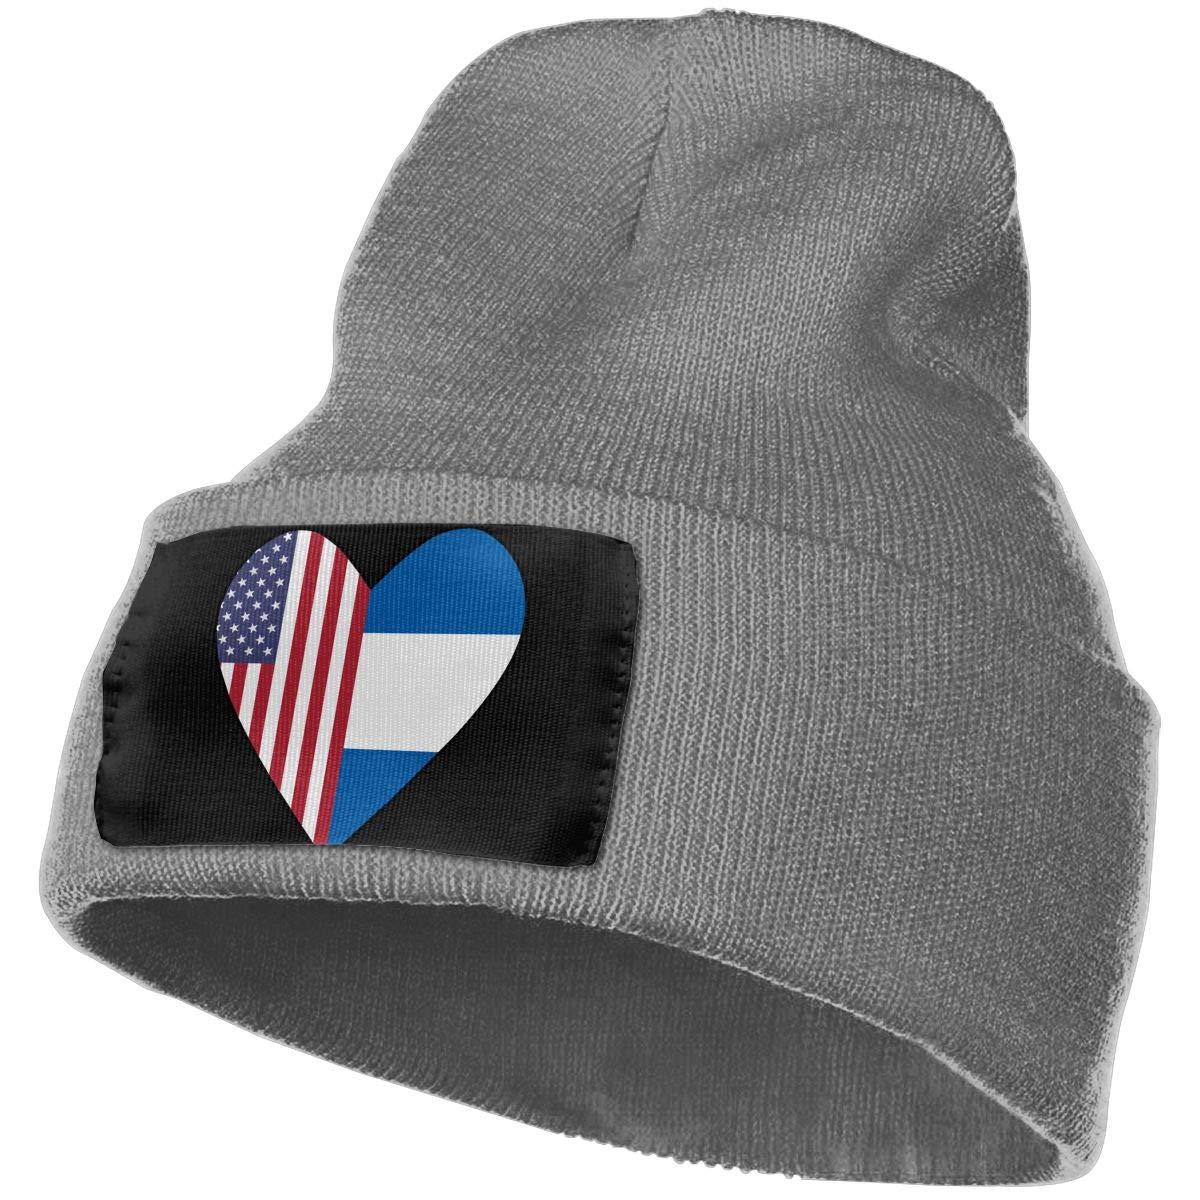 Half El Salvador Flag Half USA Flag Love Heart Men /& Women Knit Hats Stretchy /& Soft Ski Cap Beanie